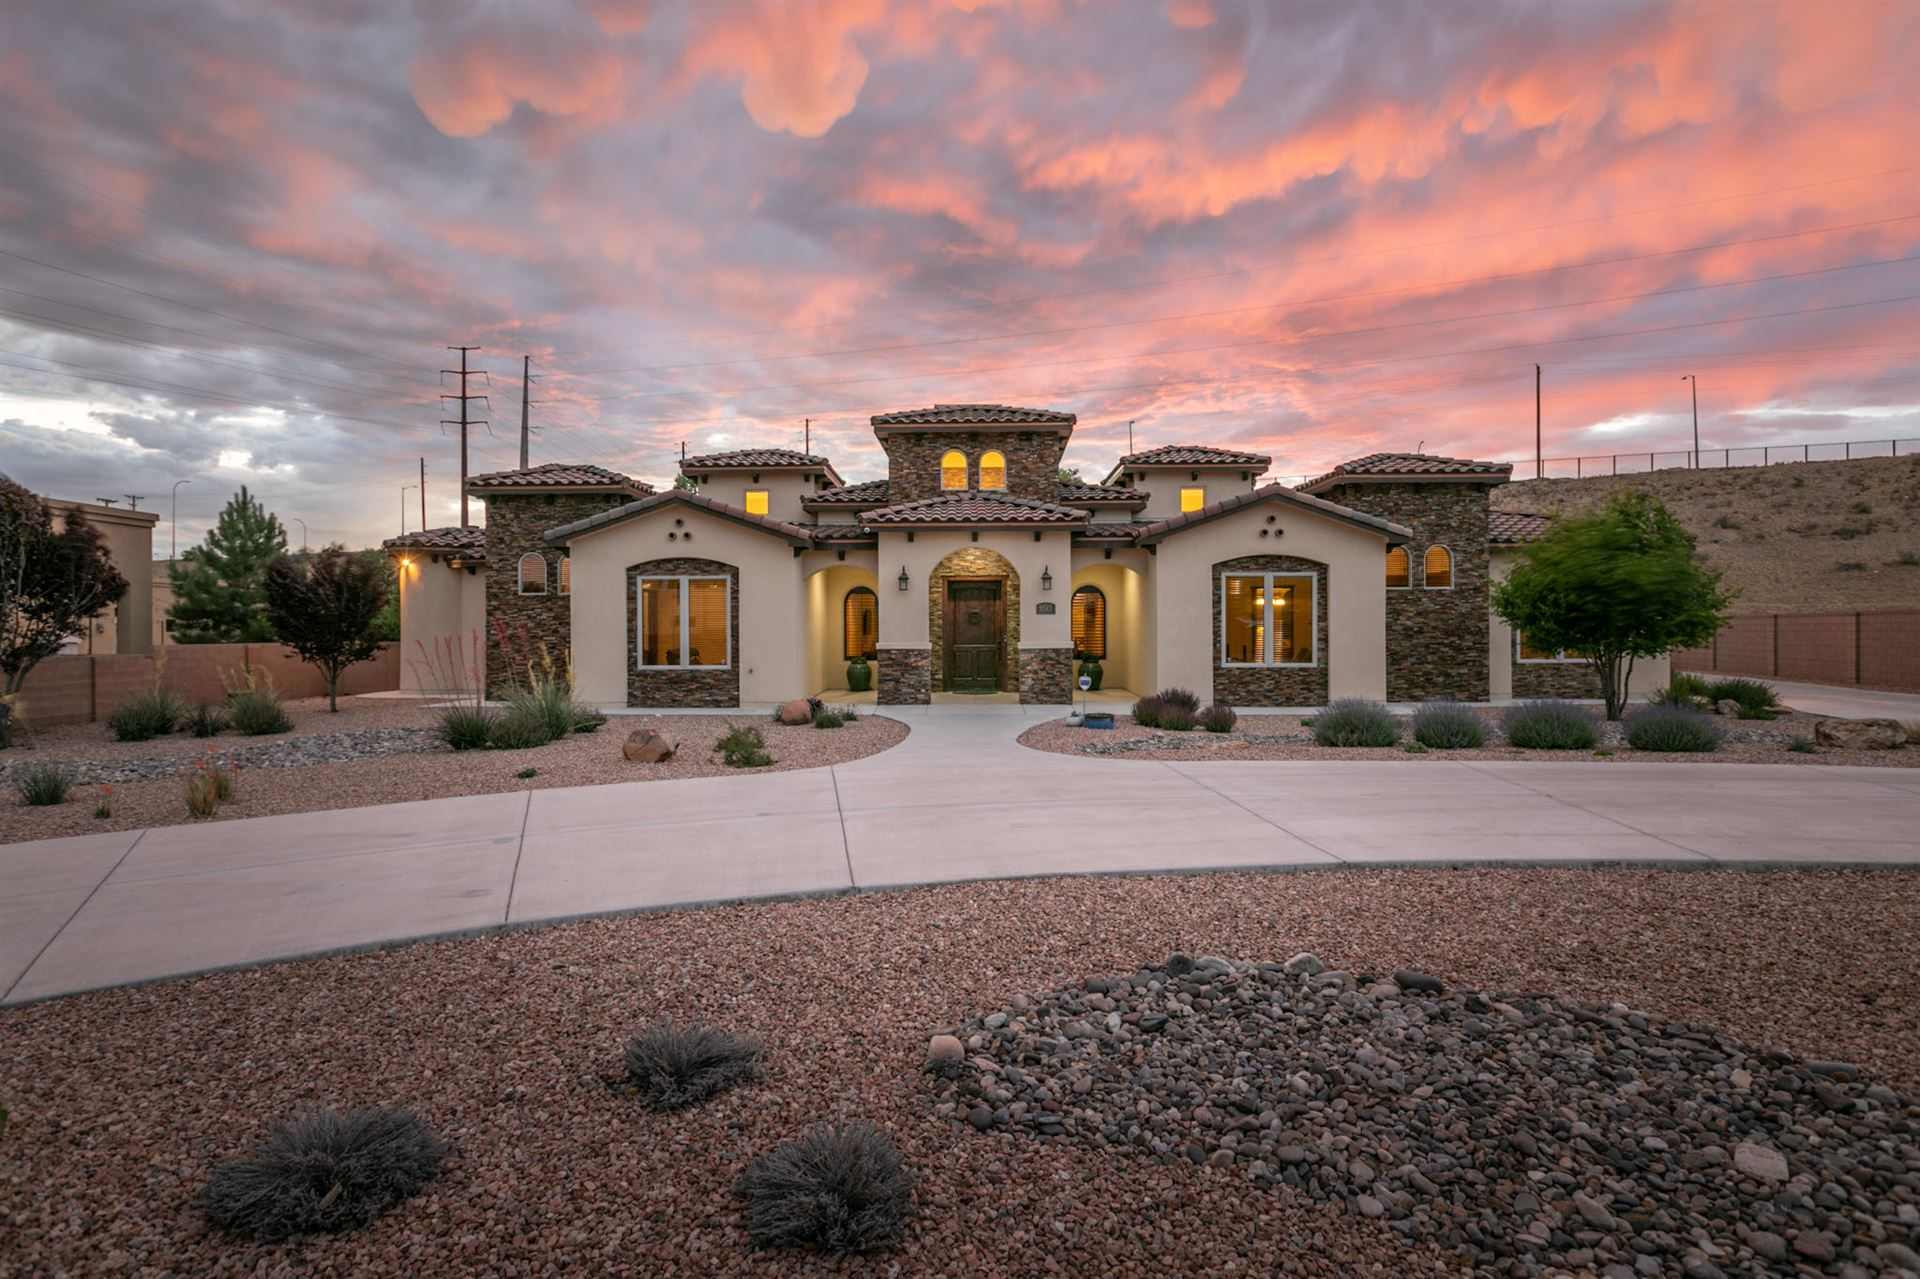 Photo of 9515 LYNDALE Lane NW, Albuquerque, NM 87114 (MLS # 969153)